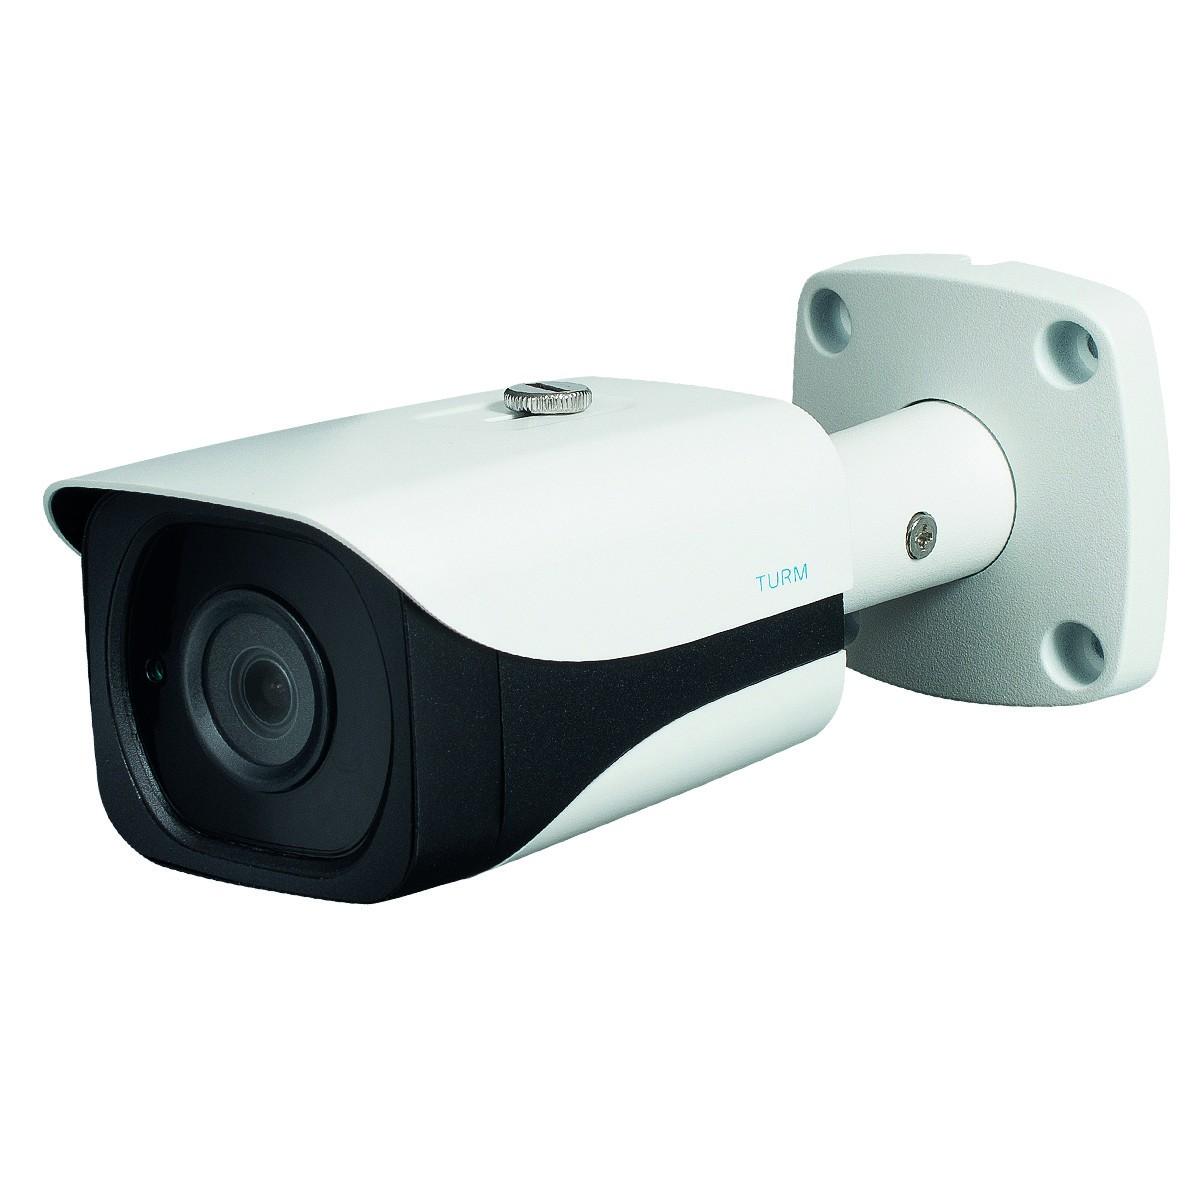 TURM HDCVI Professional 4.1 MP Bullet Kamera, 40m Nachtsicht, 3.6mm Objektiv mit 79° Blickwinkel und